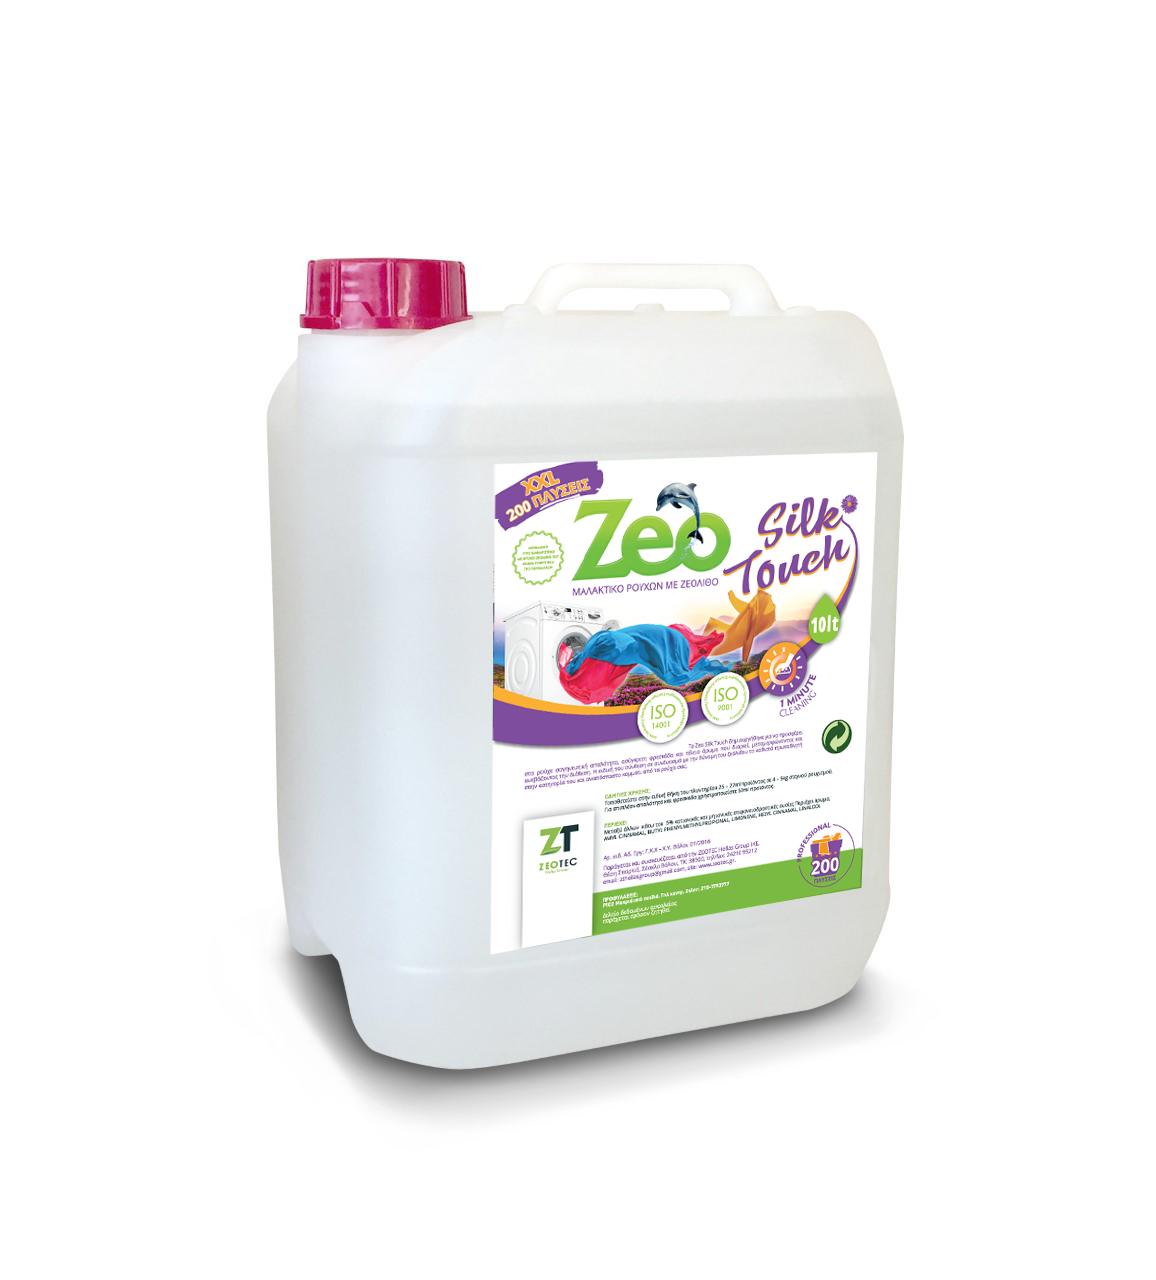 Zeo Silk Touch - Μαλακτικό πλυντηρίου ρούχων με άρωμα λουλουδιών και νότες Ανατολής 10lt